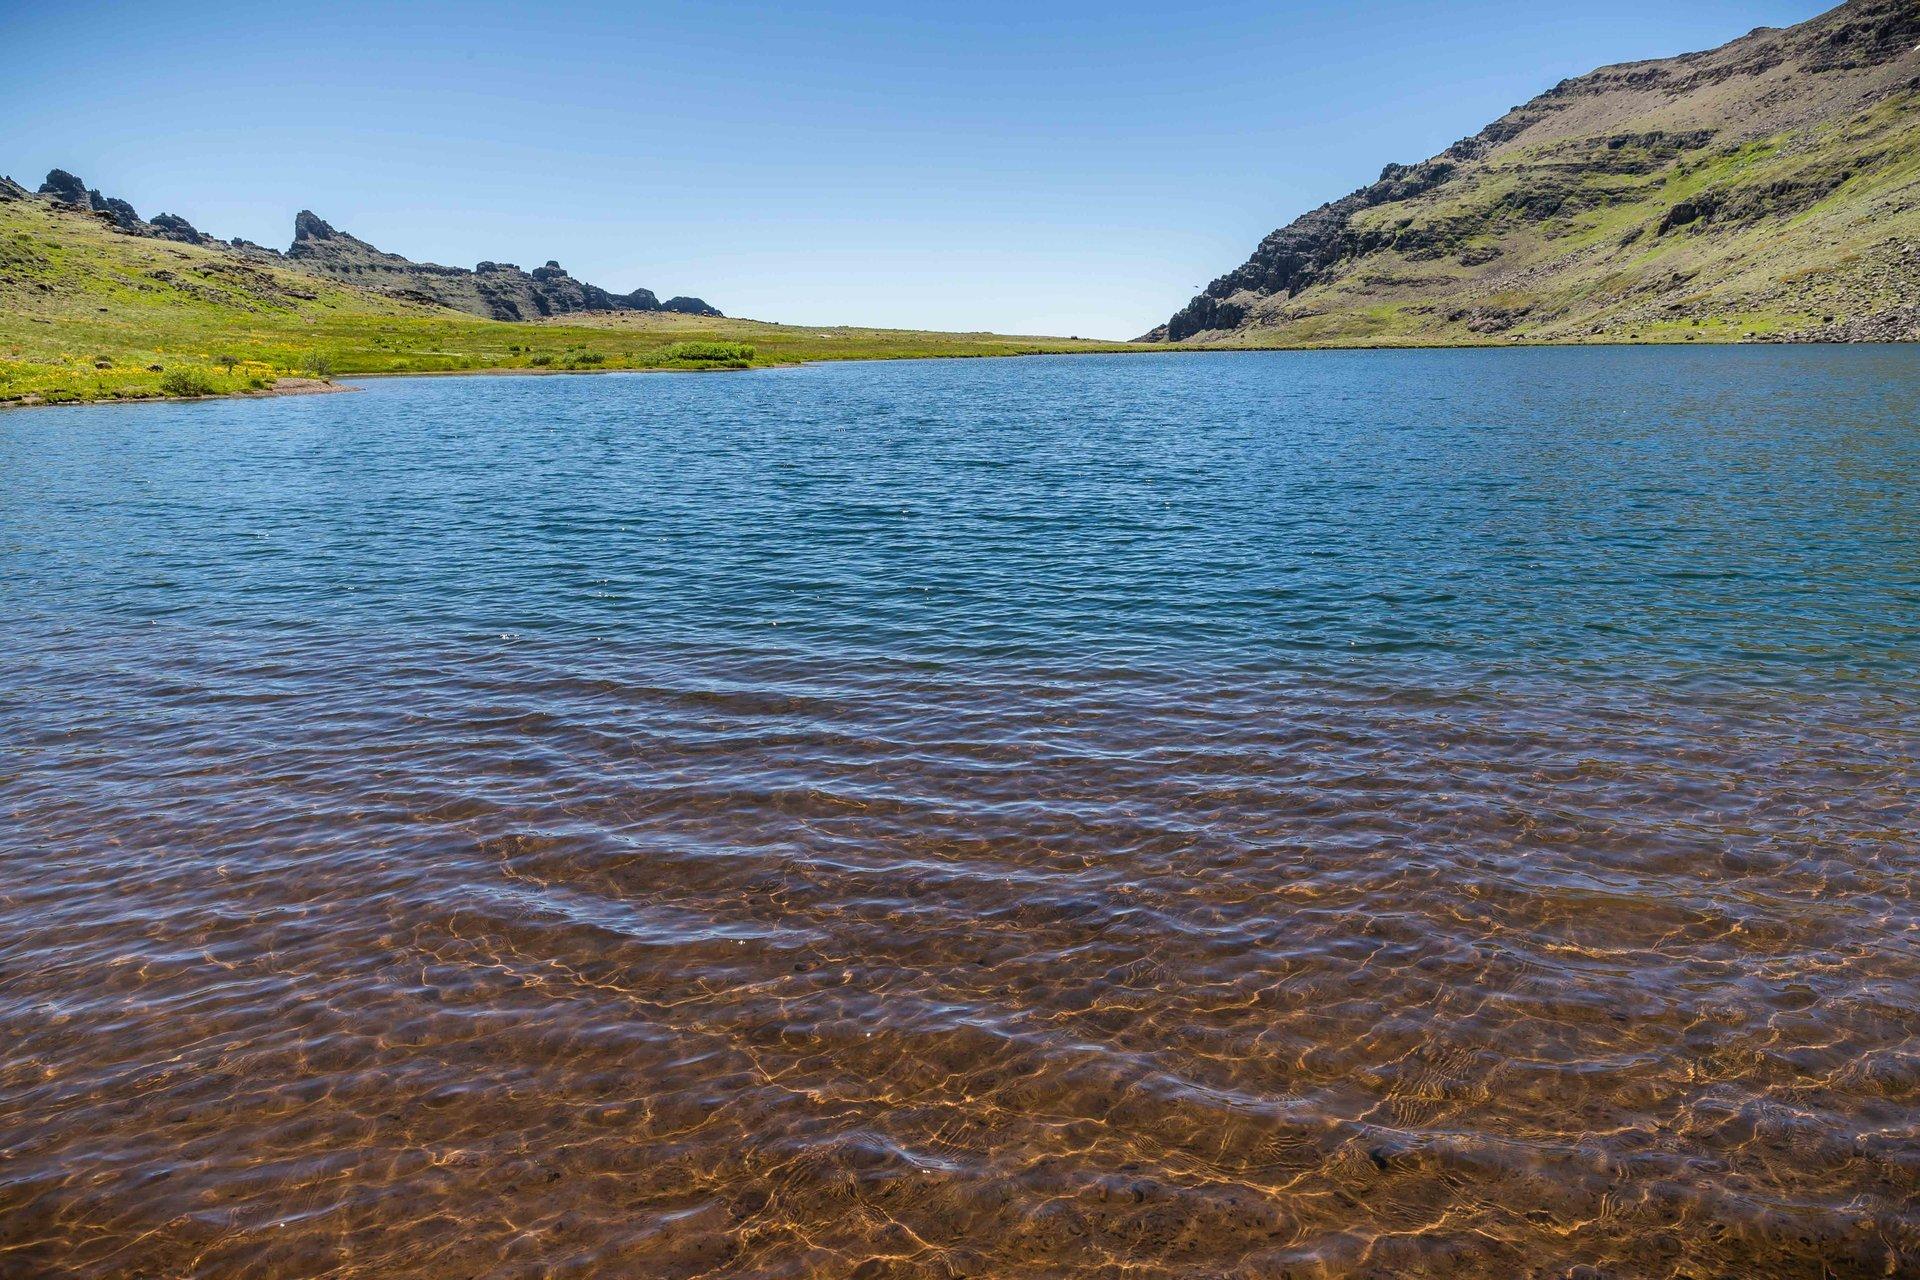 Wildhorse Lake in Oregon - Best Season 2020